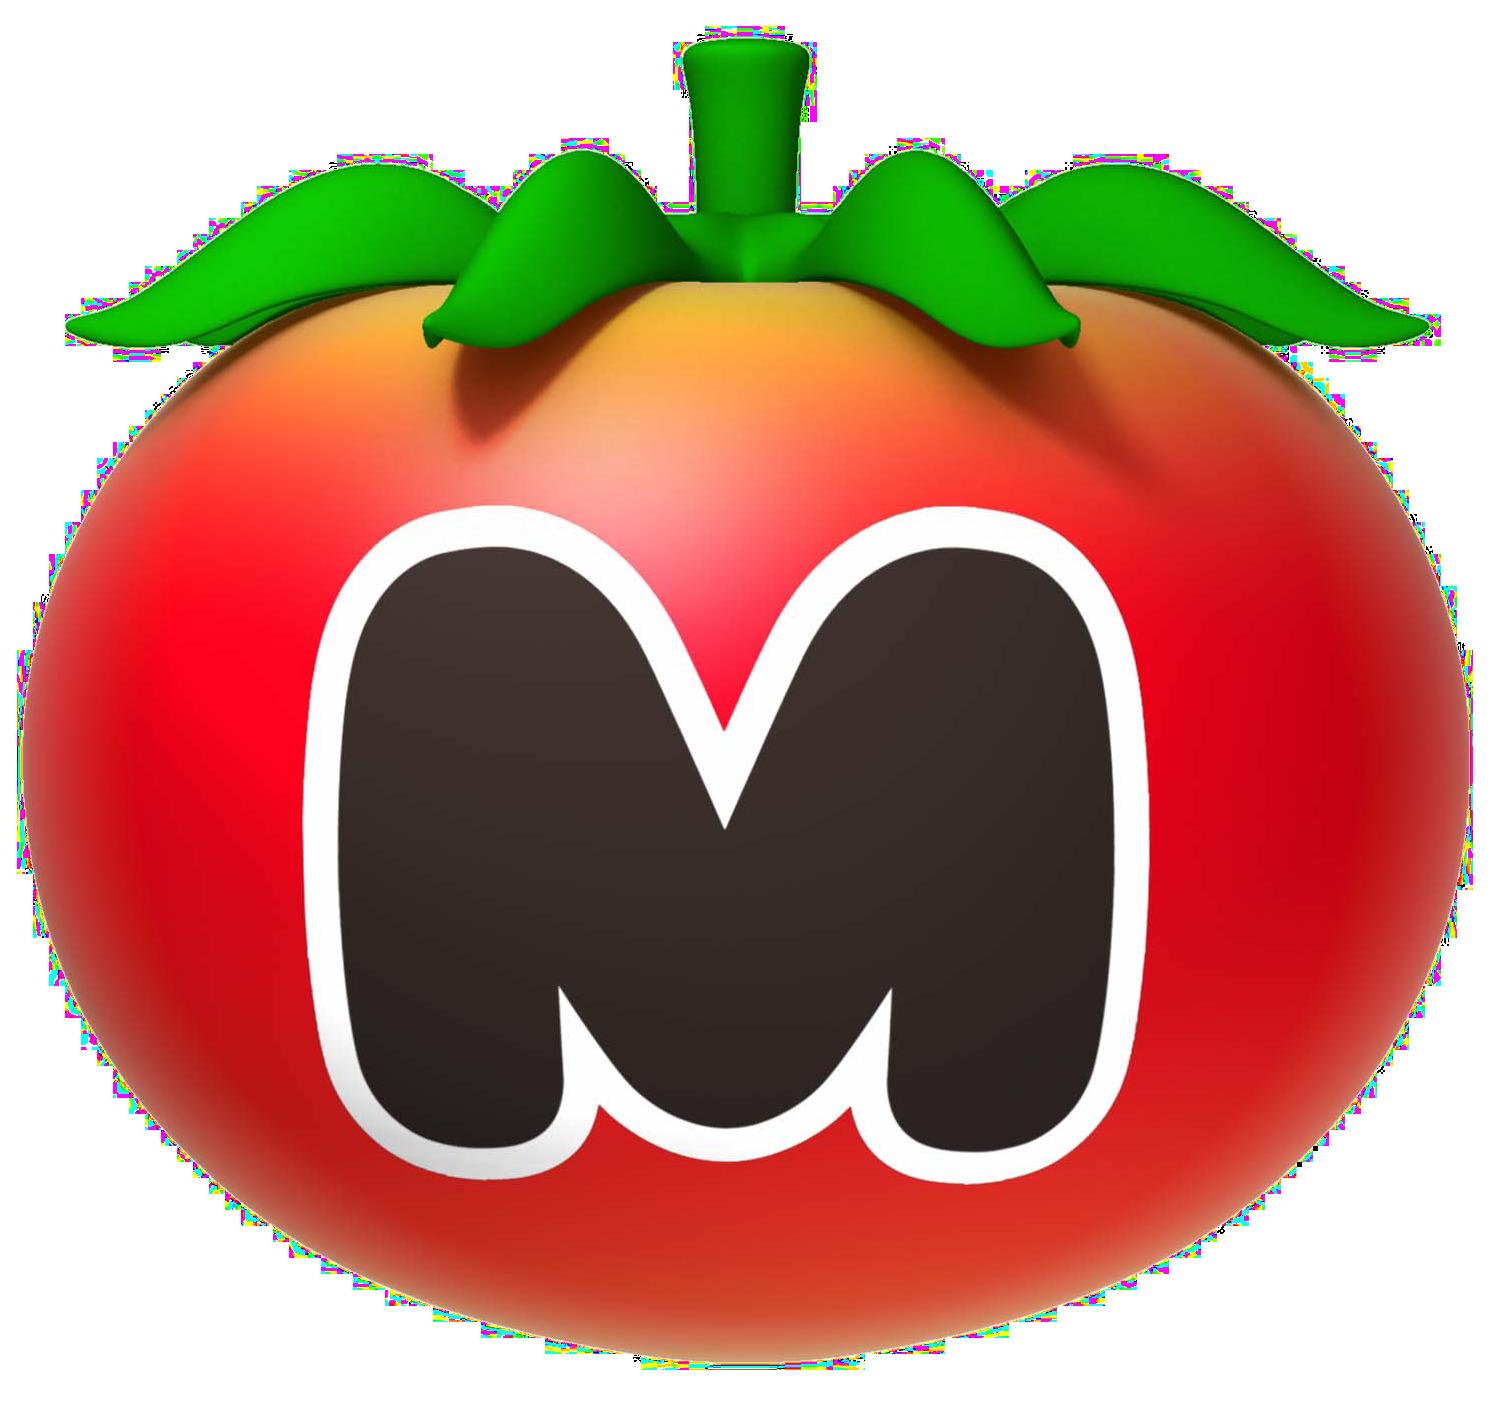 Tomatoes clipart healthy food. Maxim tomato nintendo fandom